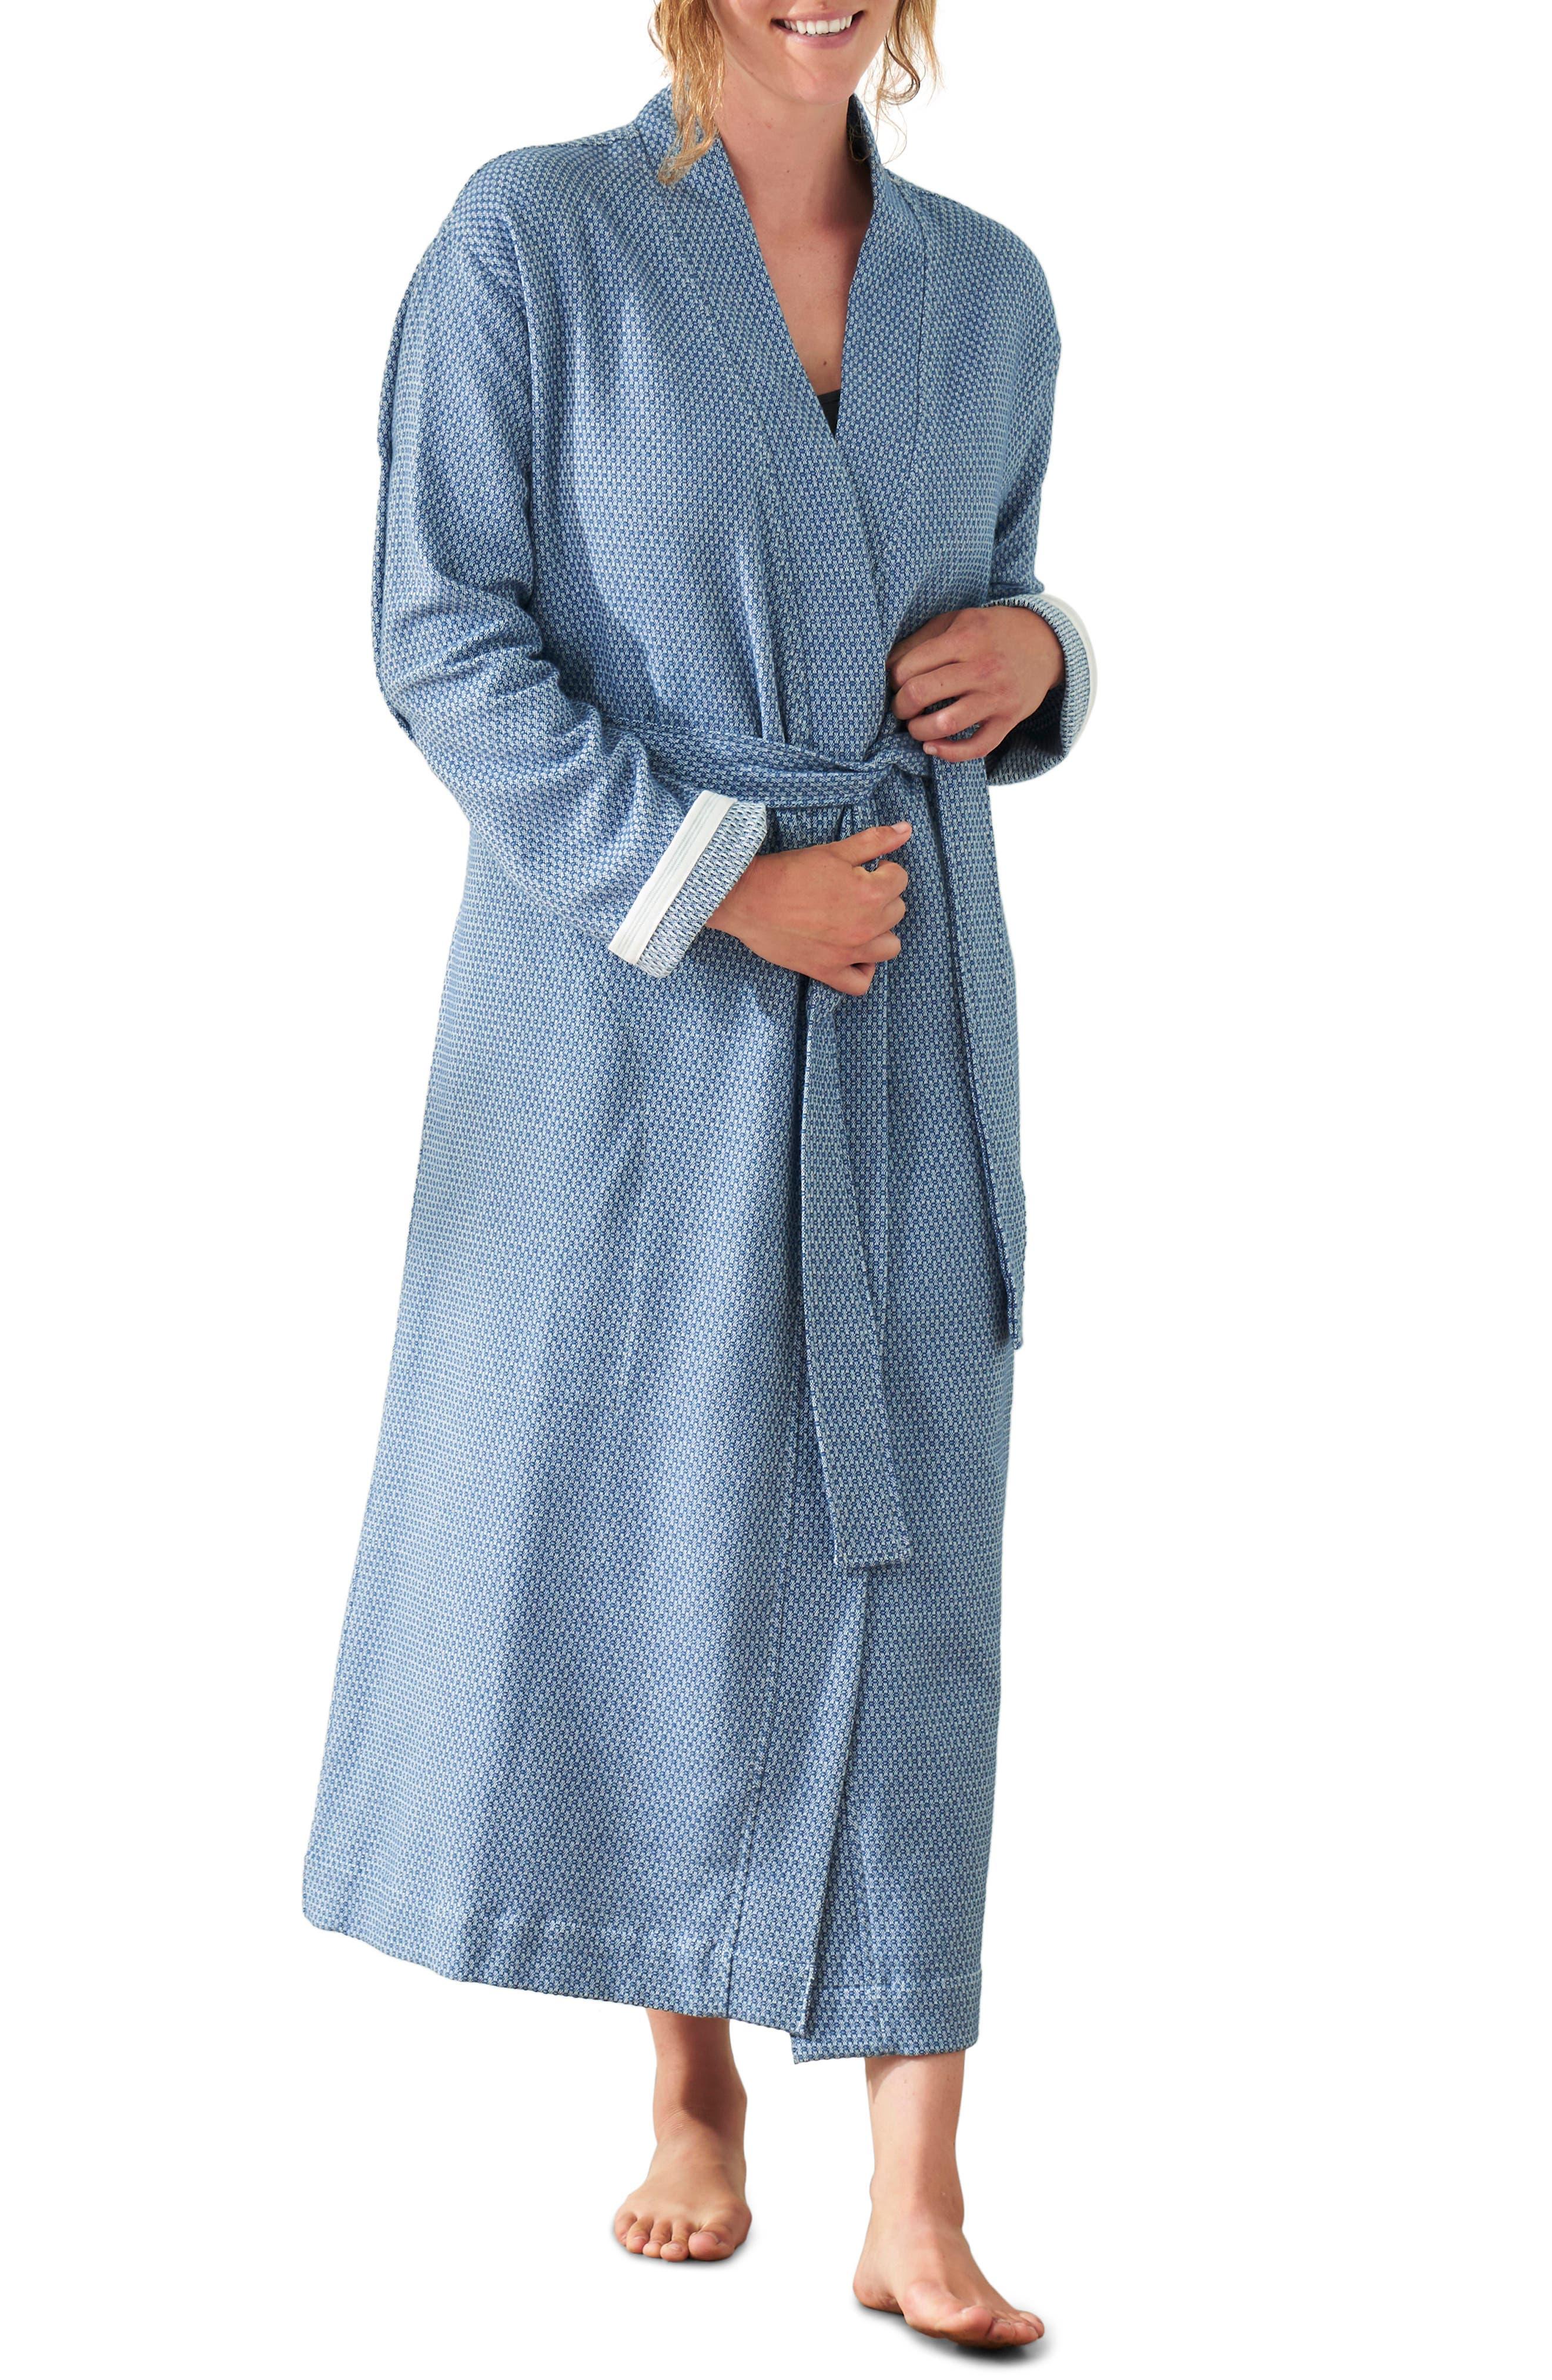 Coyuchi Unisex Mediterranean Organic Cotton Robe